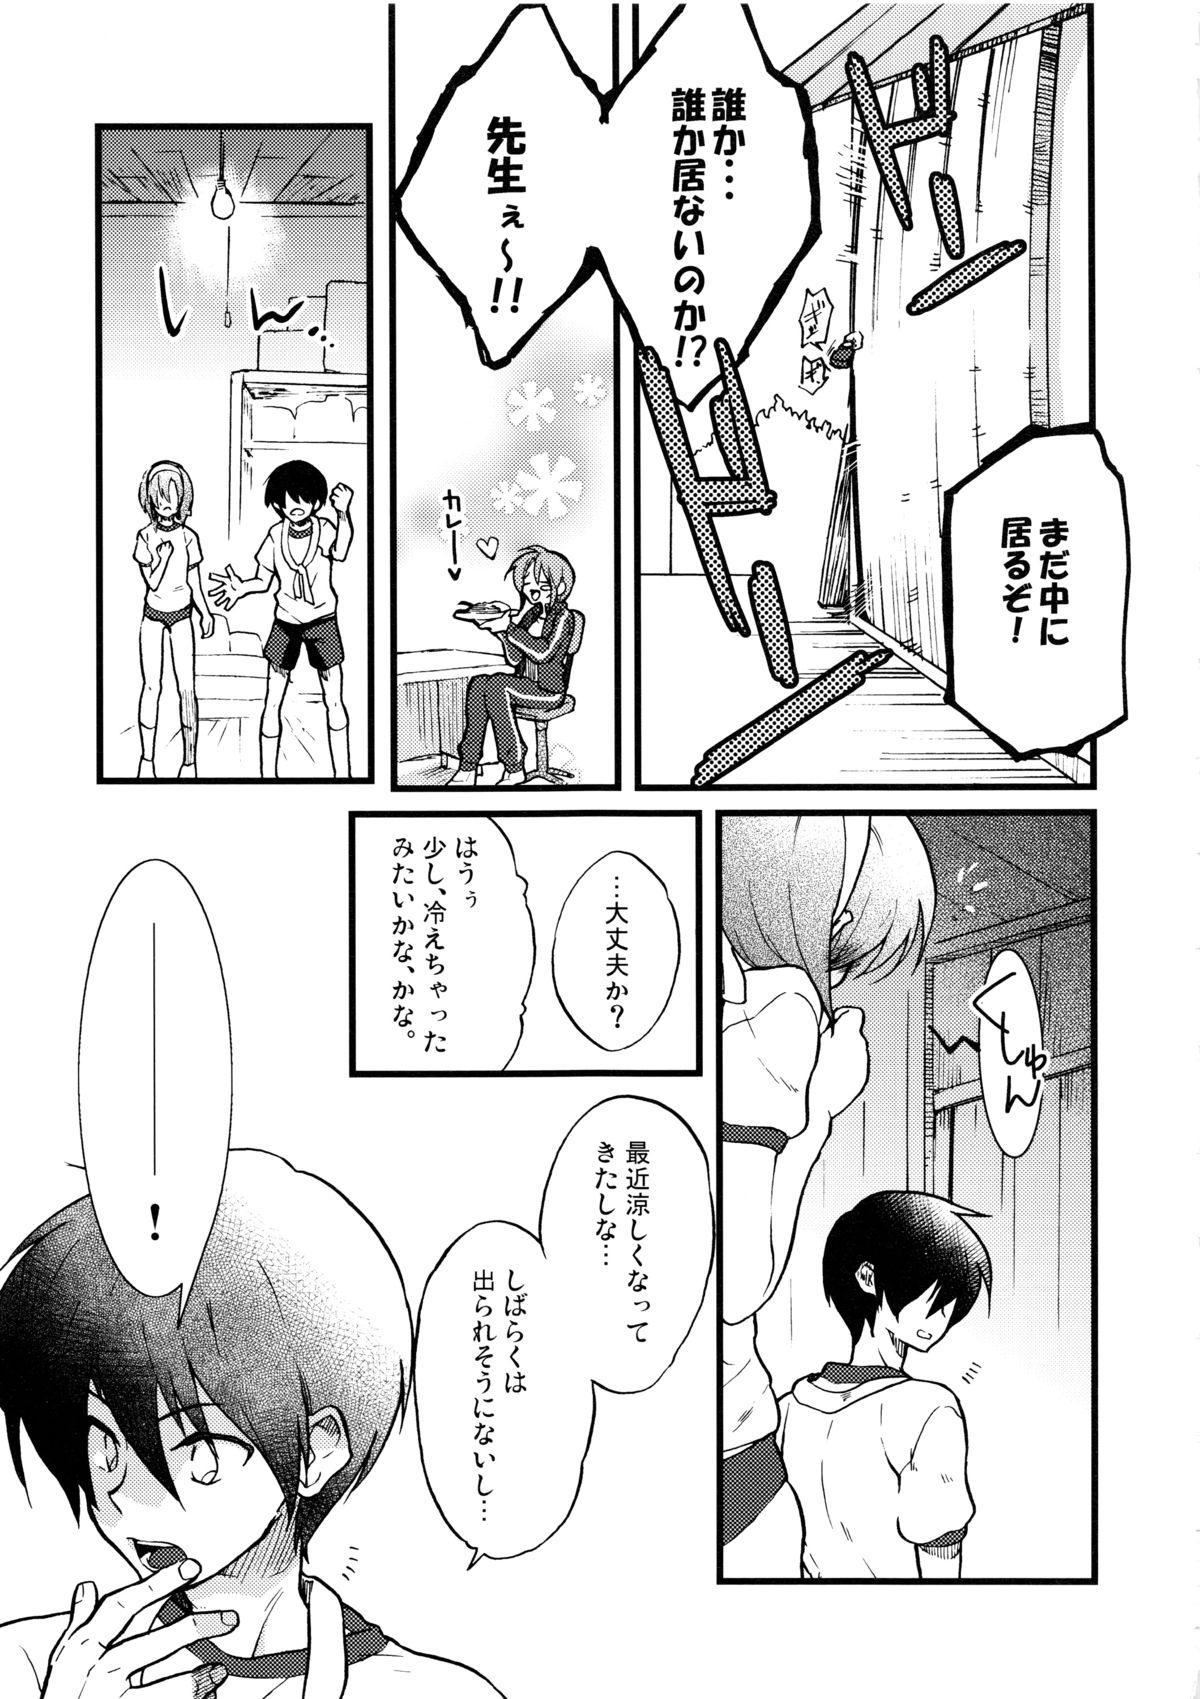 School-mer! School Mizugi Bloomer Joshi Anthology 95